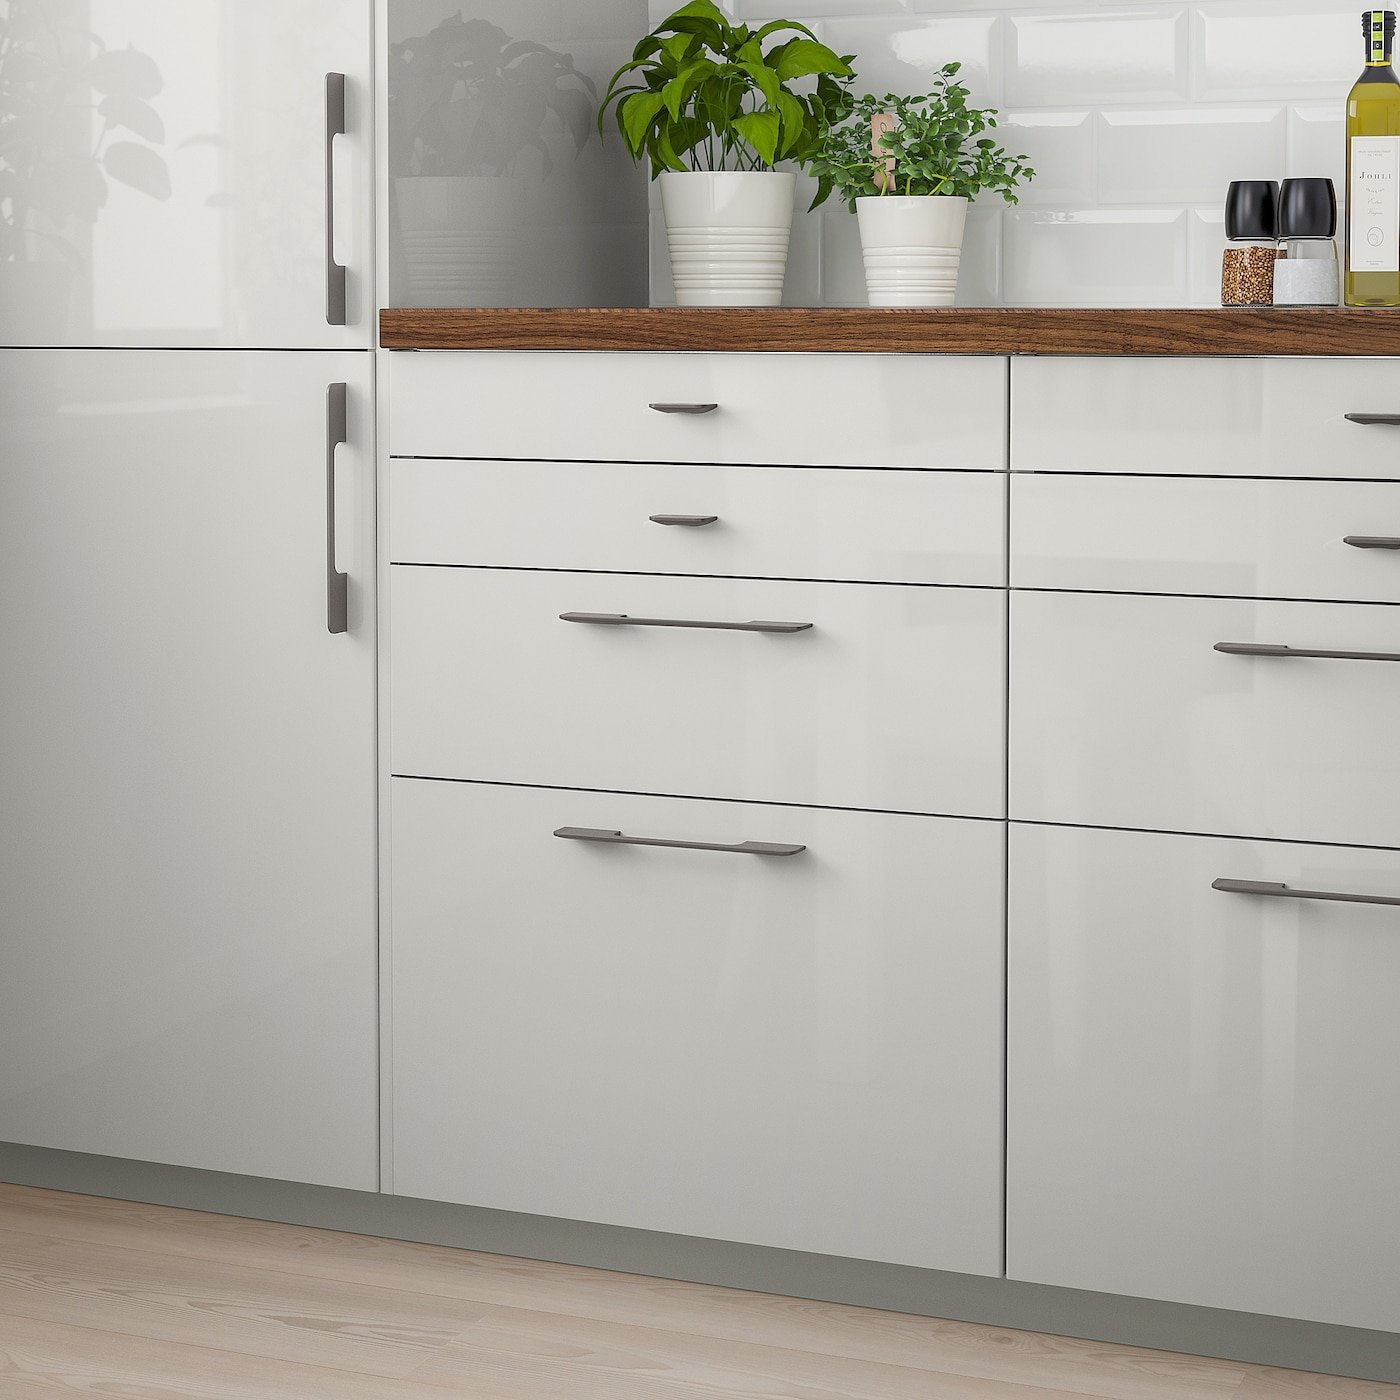 RINGHULT Drawer front   high gloss light grey 9x9 cm